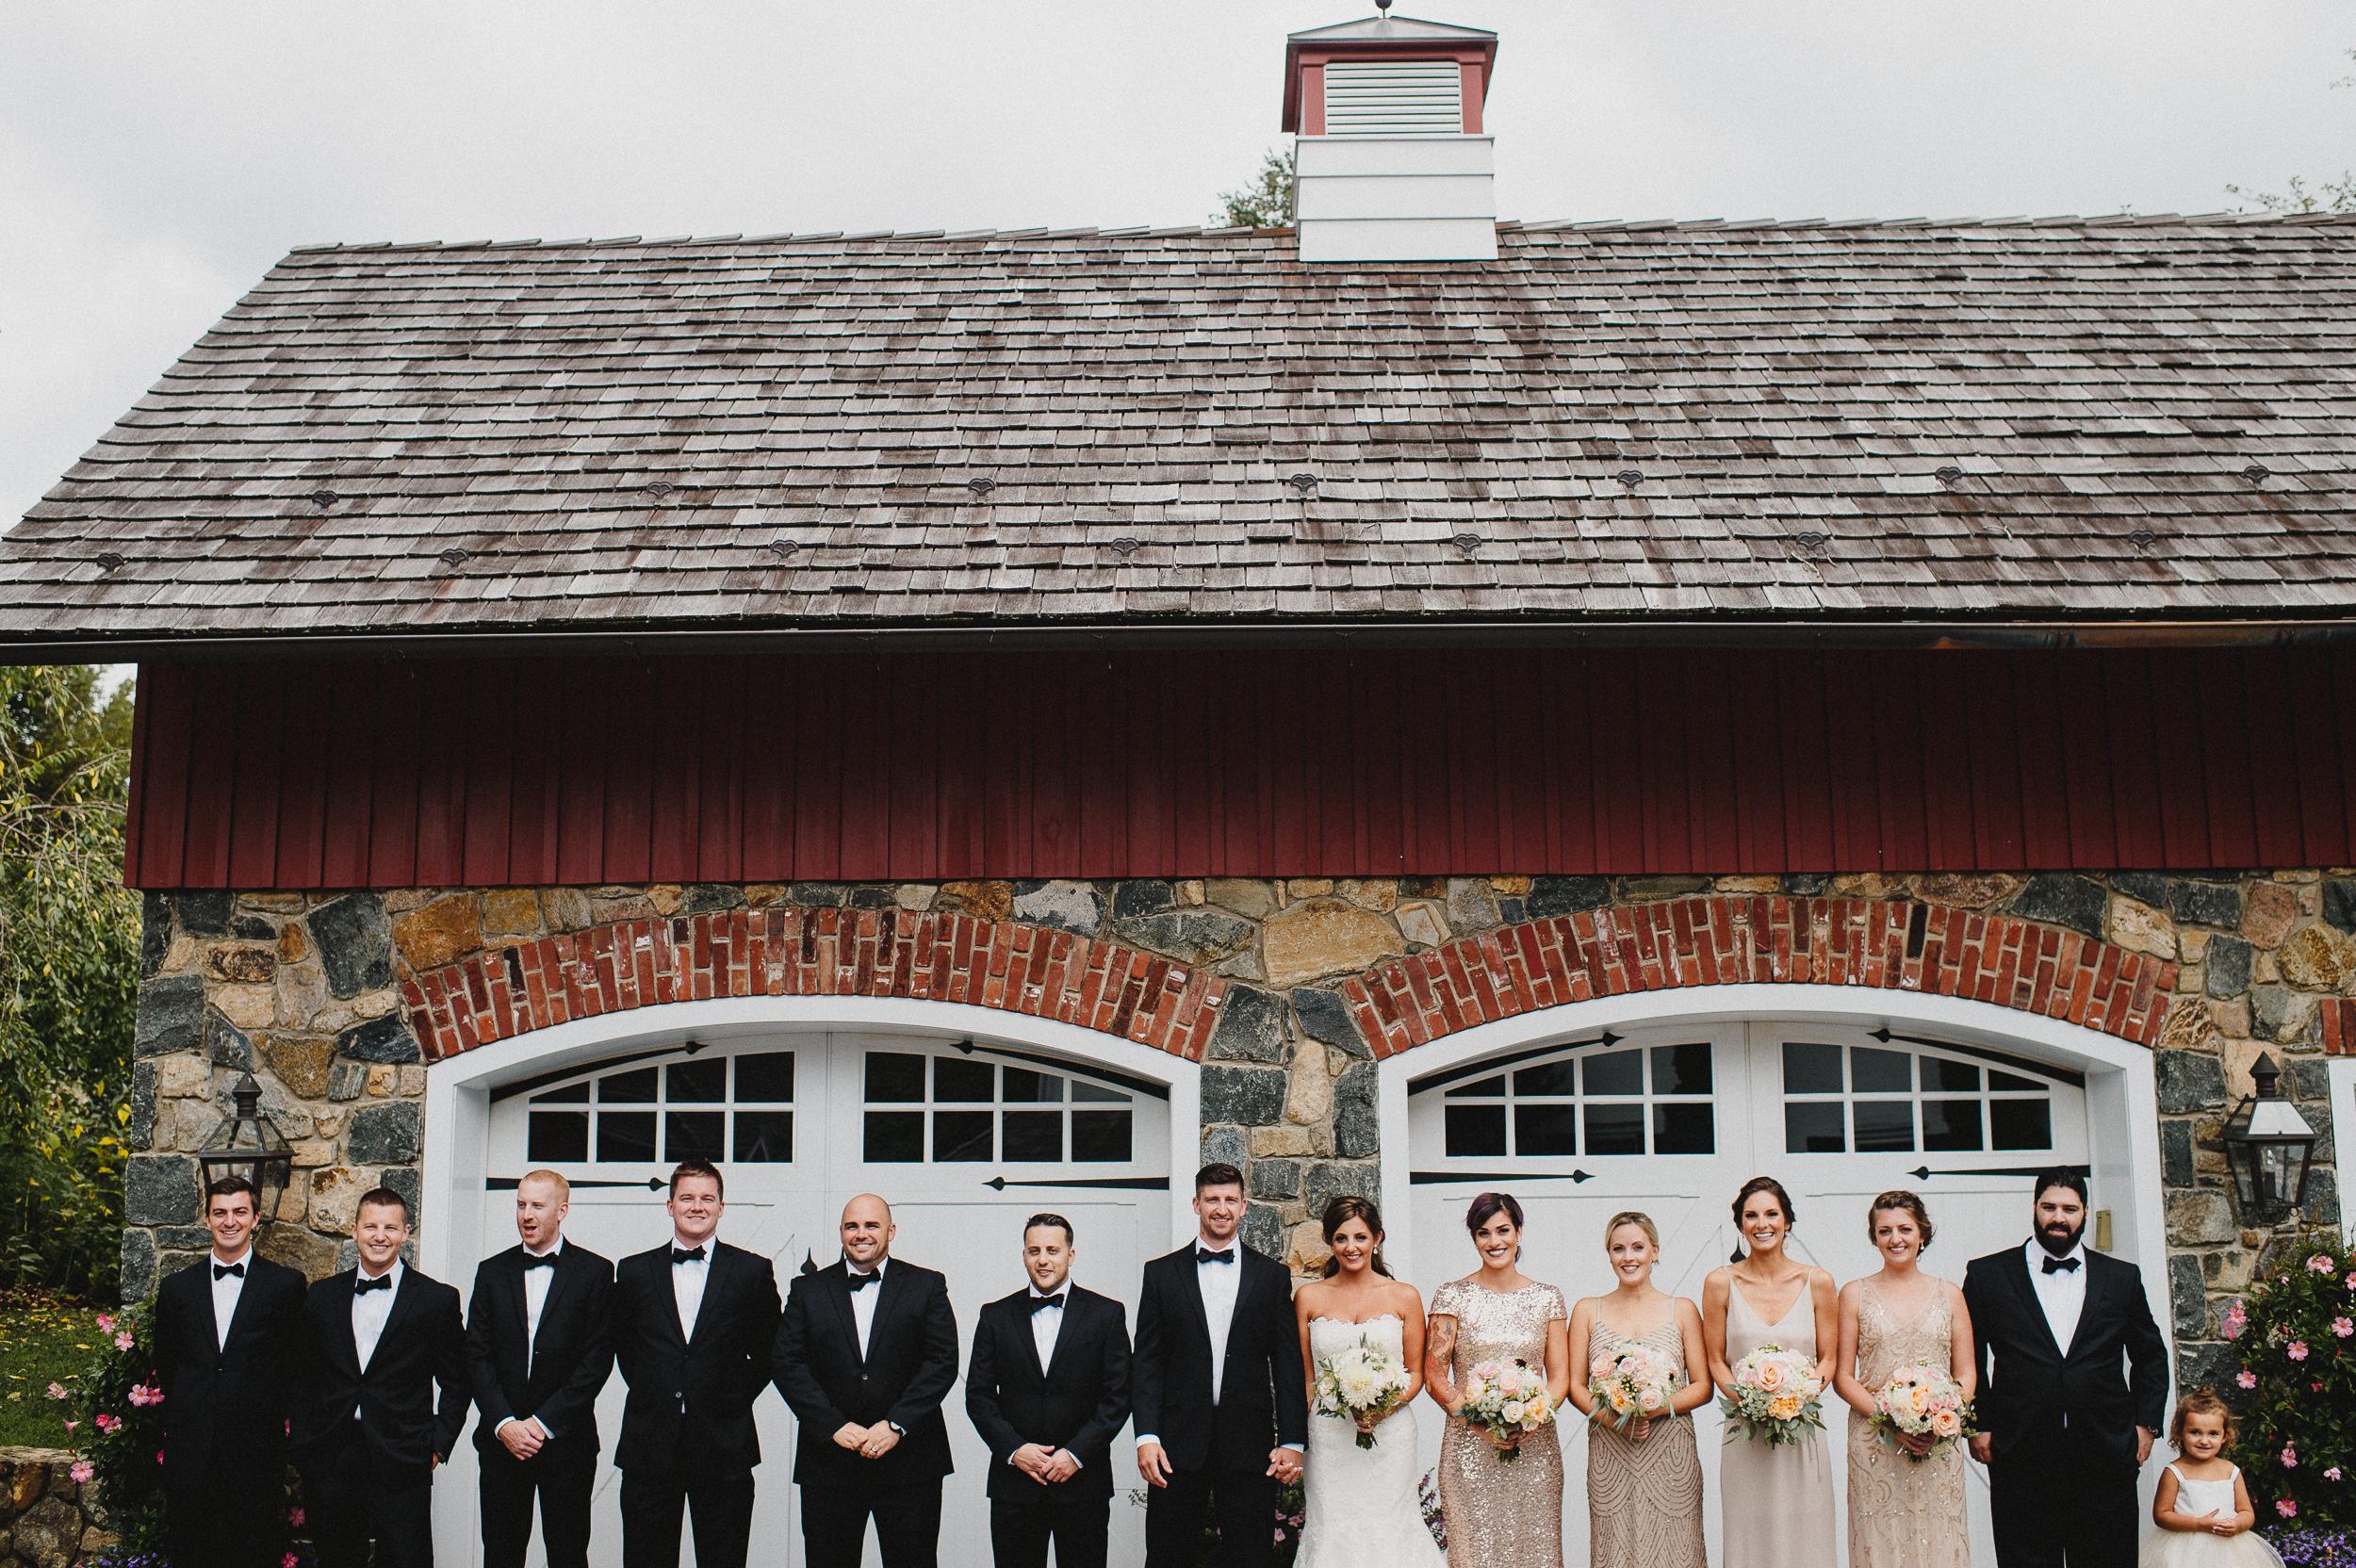 delaware-estate-wedding-photographer-pat-robinson-photography-41.jpg